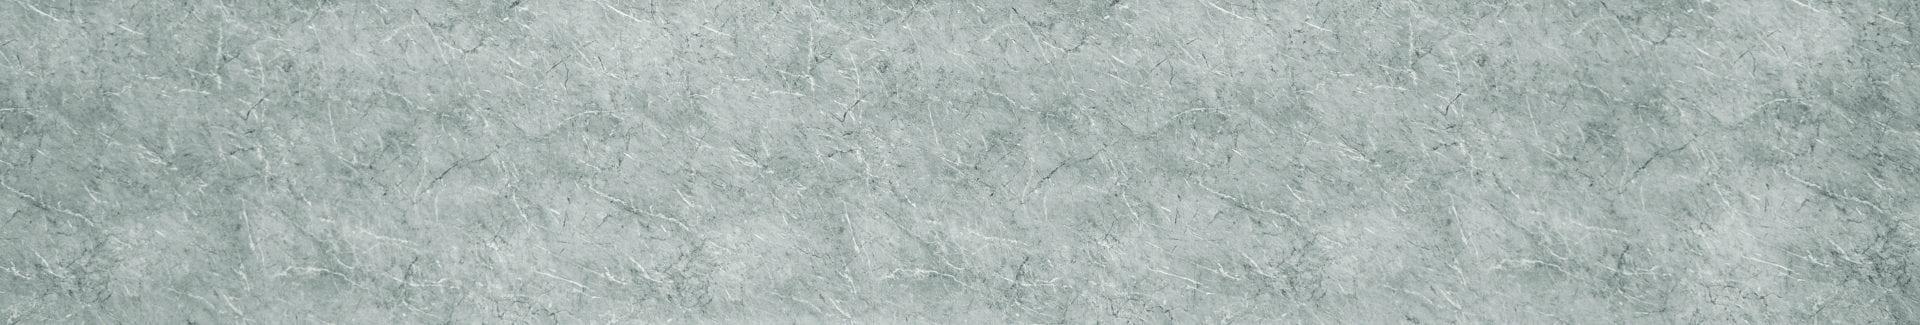 Silverback Marble Full Length Laminate Worktop by Topform